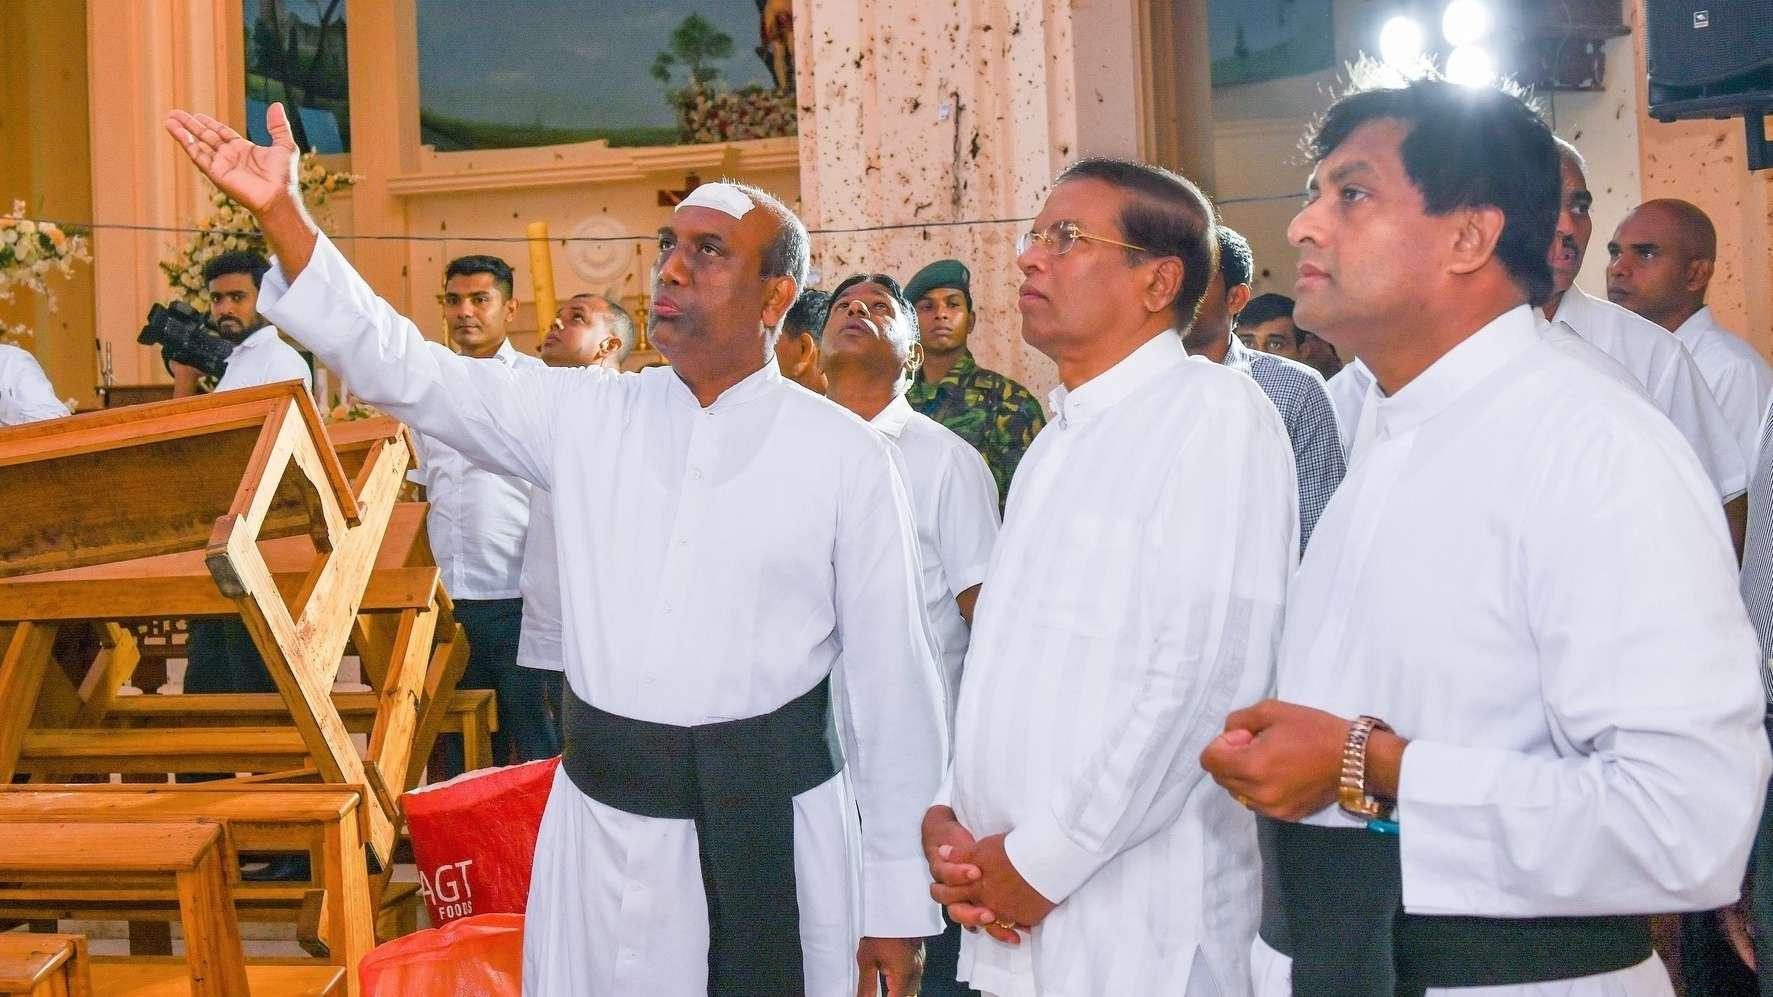 Sri Lanks Präsident Maithripala Sirisena (2. v. r.) besucht die verwüstete Kirche St. Sebastian